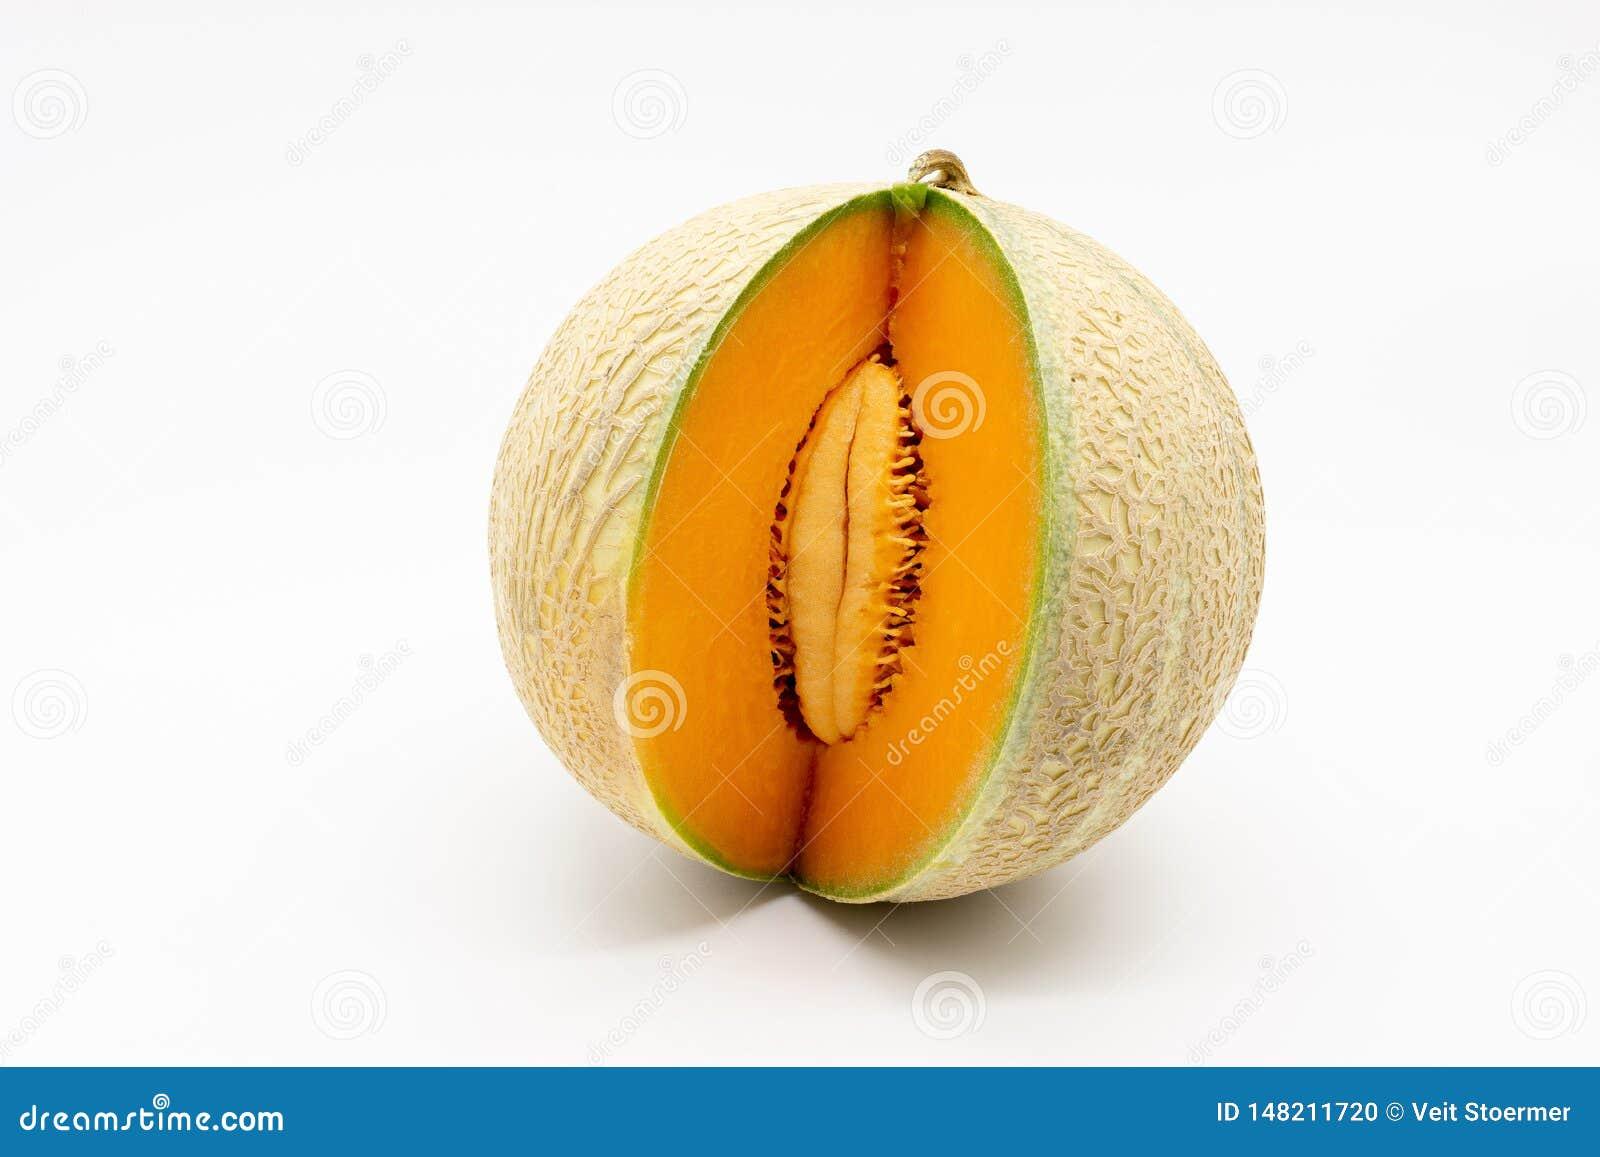 Charentais/cantalupemelon